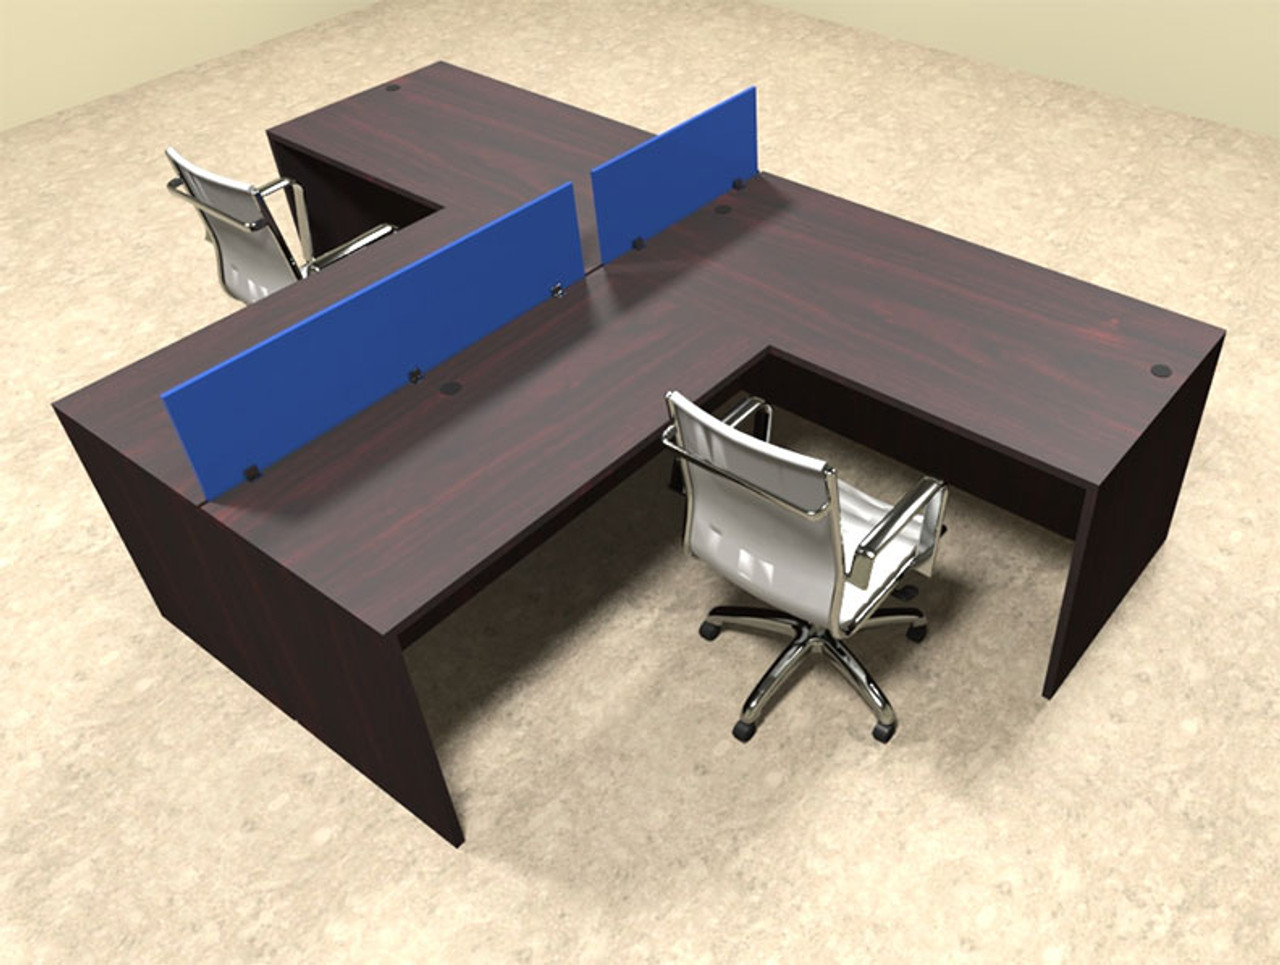 Two Person Blue Divider Office Workstation Desk Set, #OT-SUL-SPB43